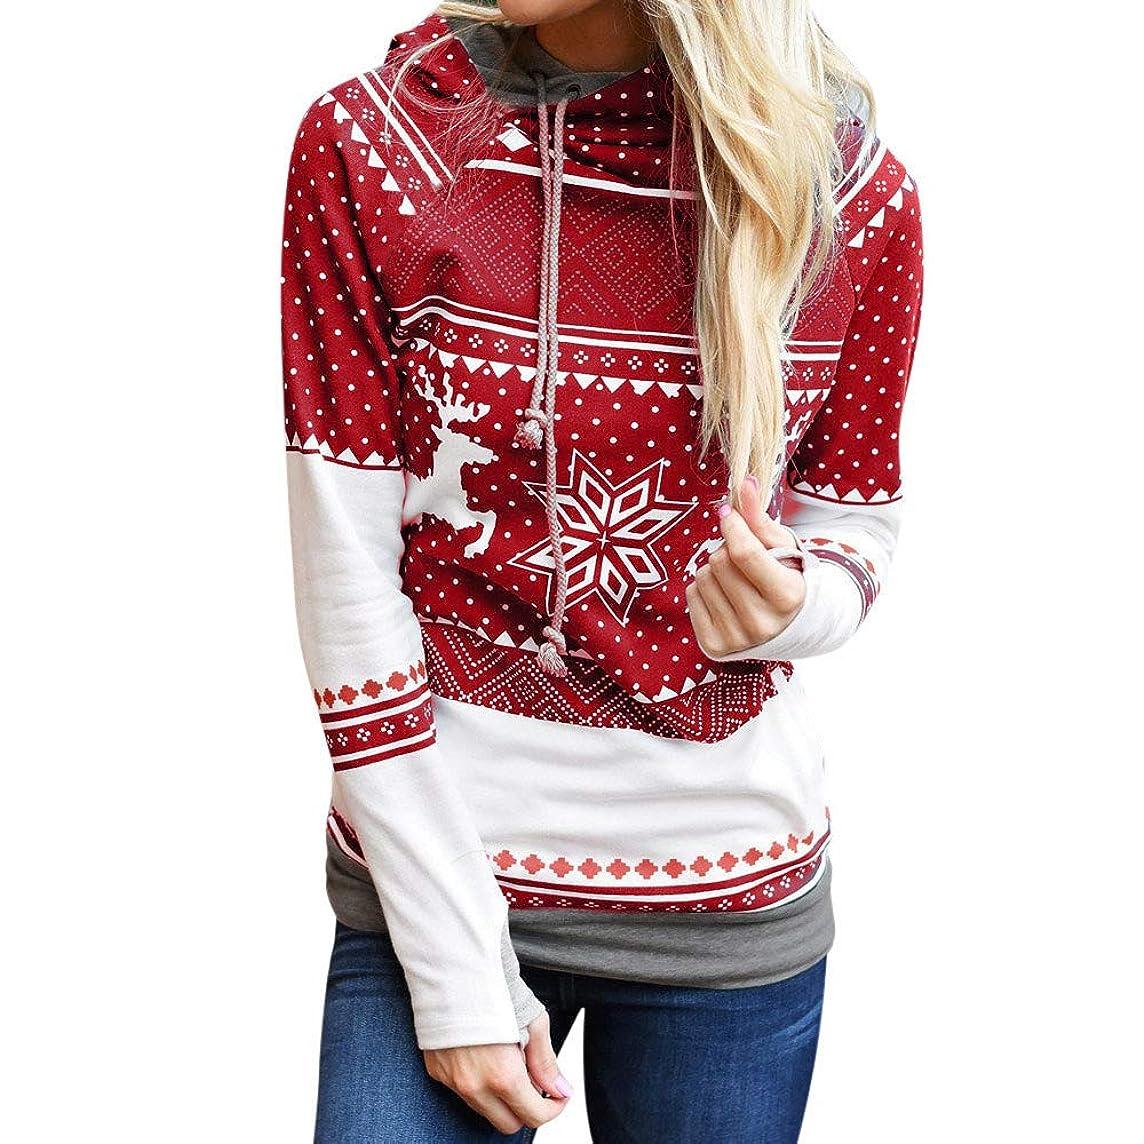 Franterd Xmas Blouse Women Christmas Dots Elk Snowflake Print Caps Drawstring Hooded Sweatshirt Pullover